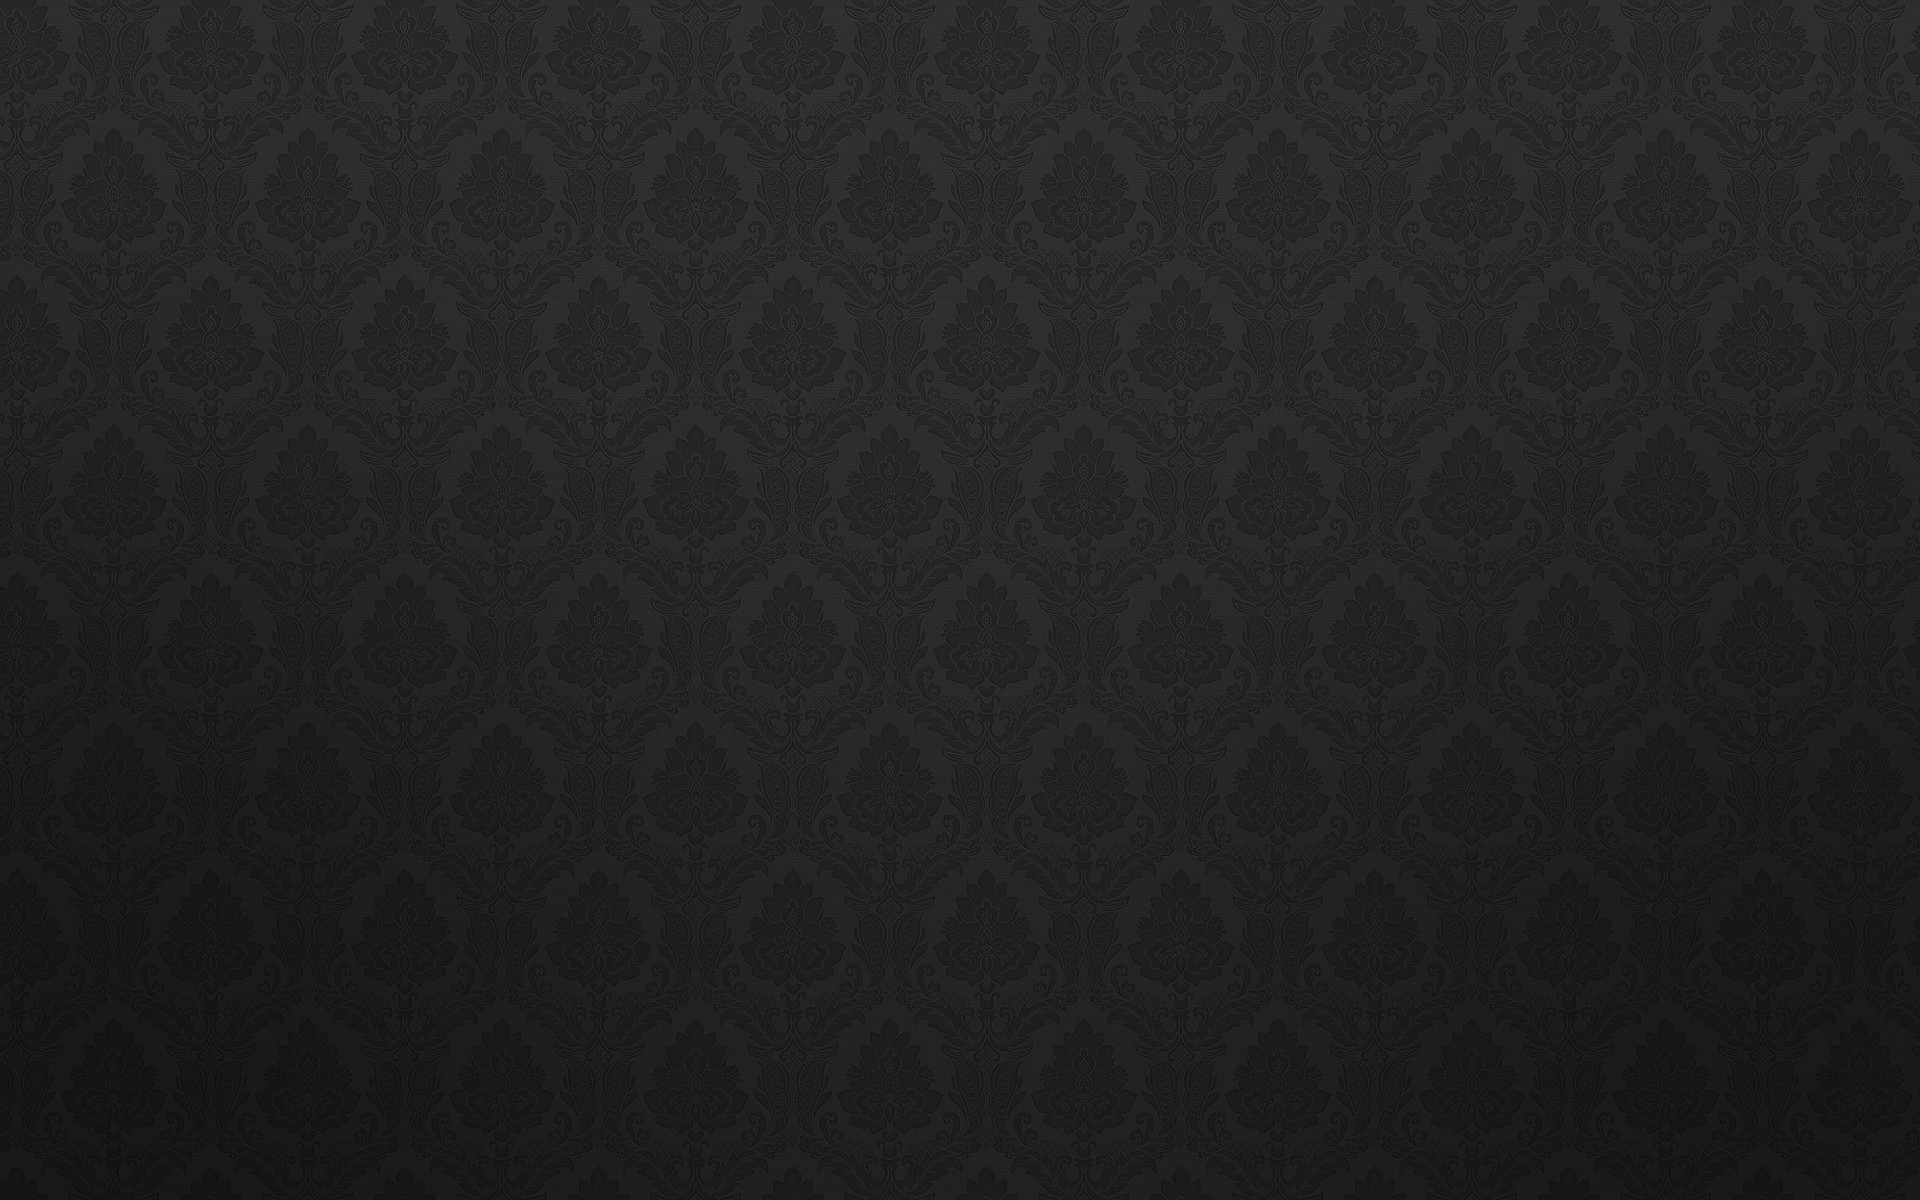 HD wallpaper Otife Dark black plain design backgroundjpg   Yahara 1920x1200